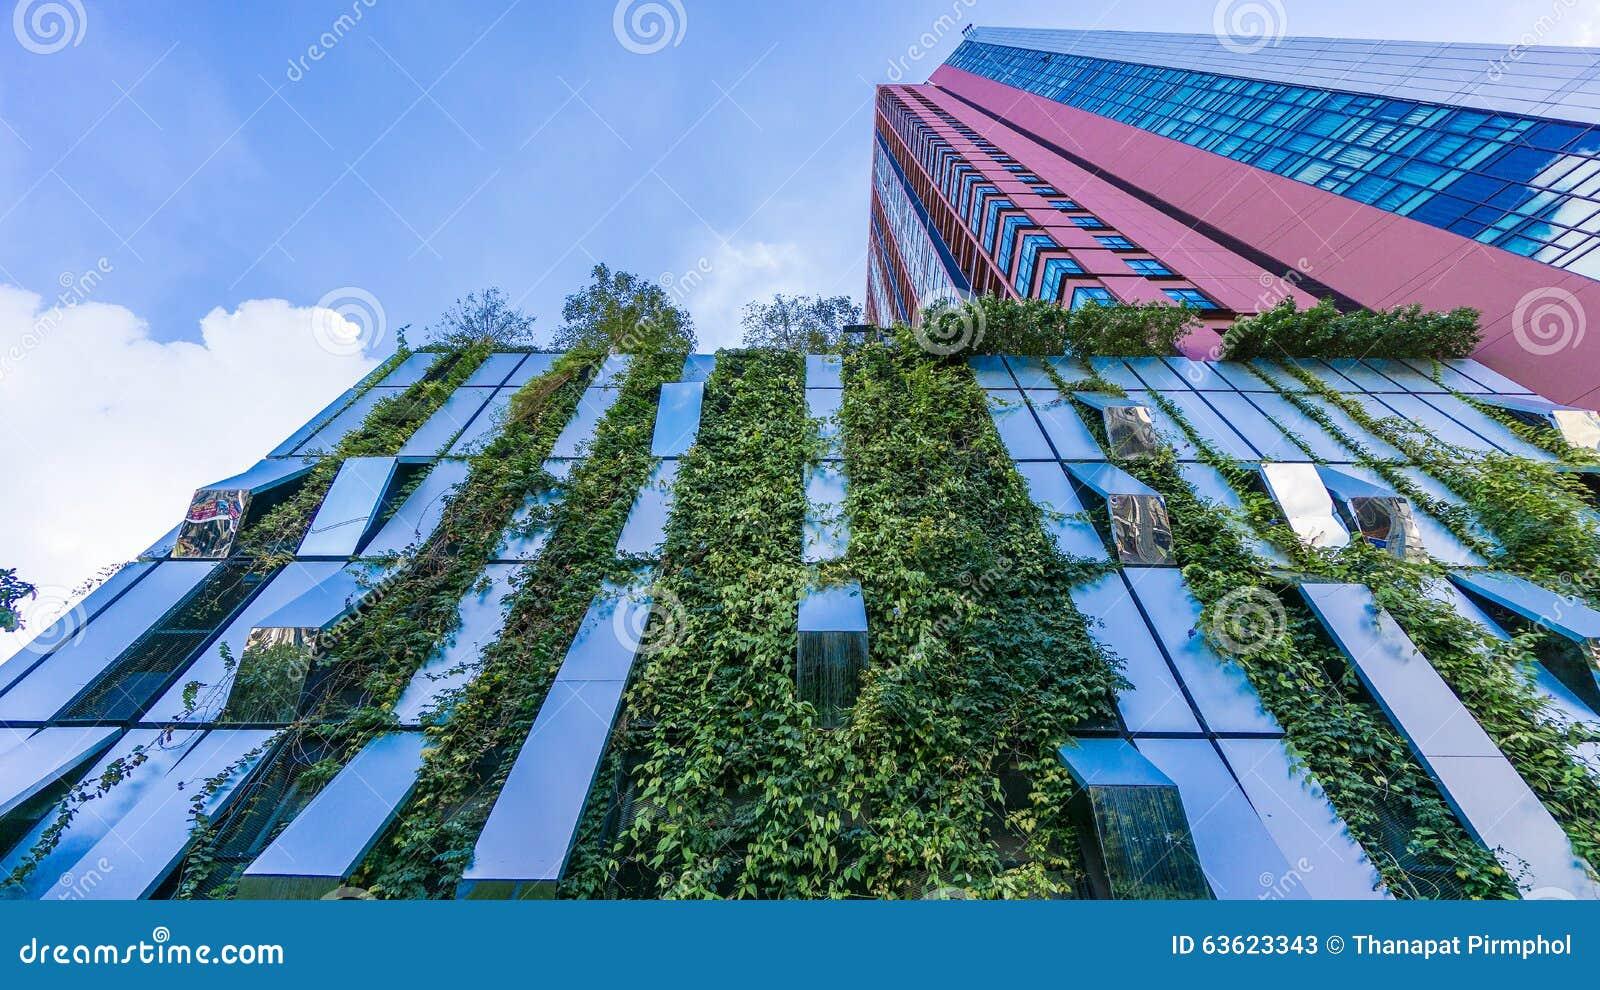 Bangkok, Thailand - 22 November 2015 : Vertical Garden of Wyne Sukhumvit (the high-end condominium) at the Sukhumvit mid-town